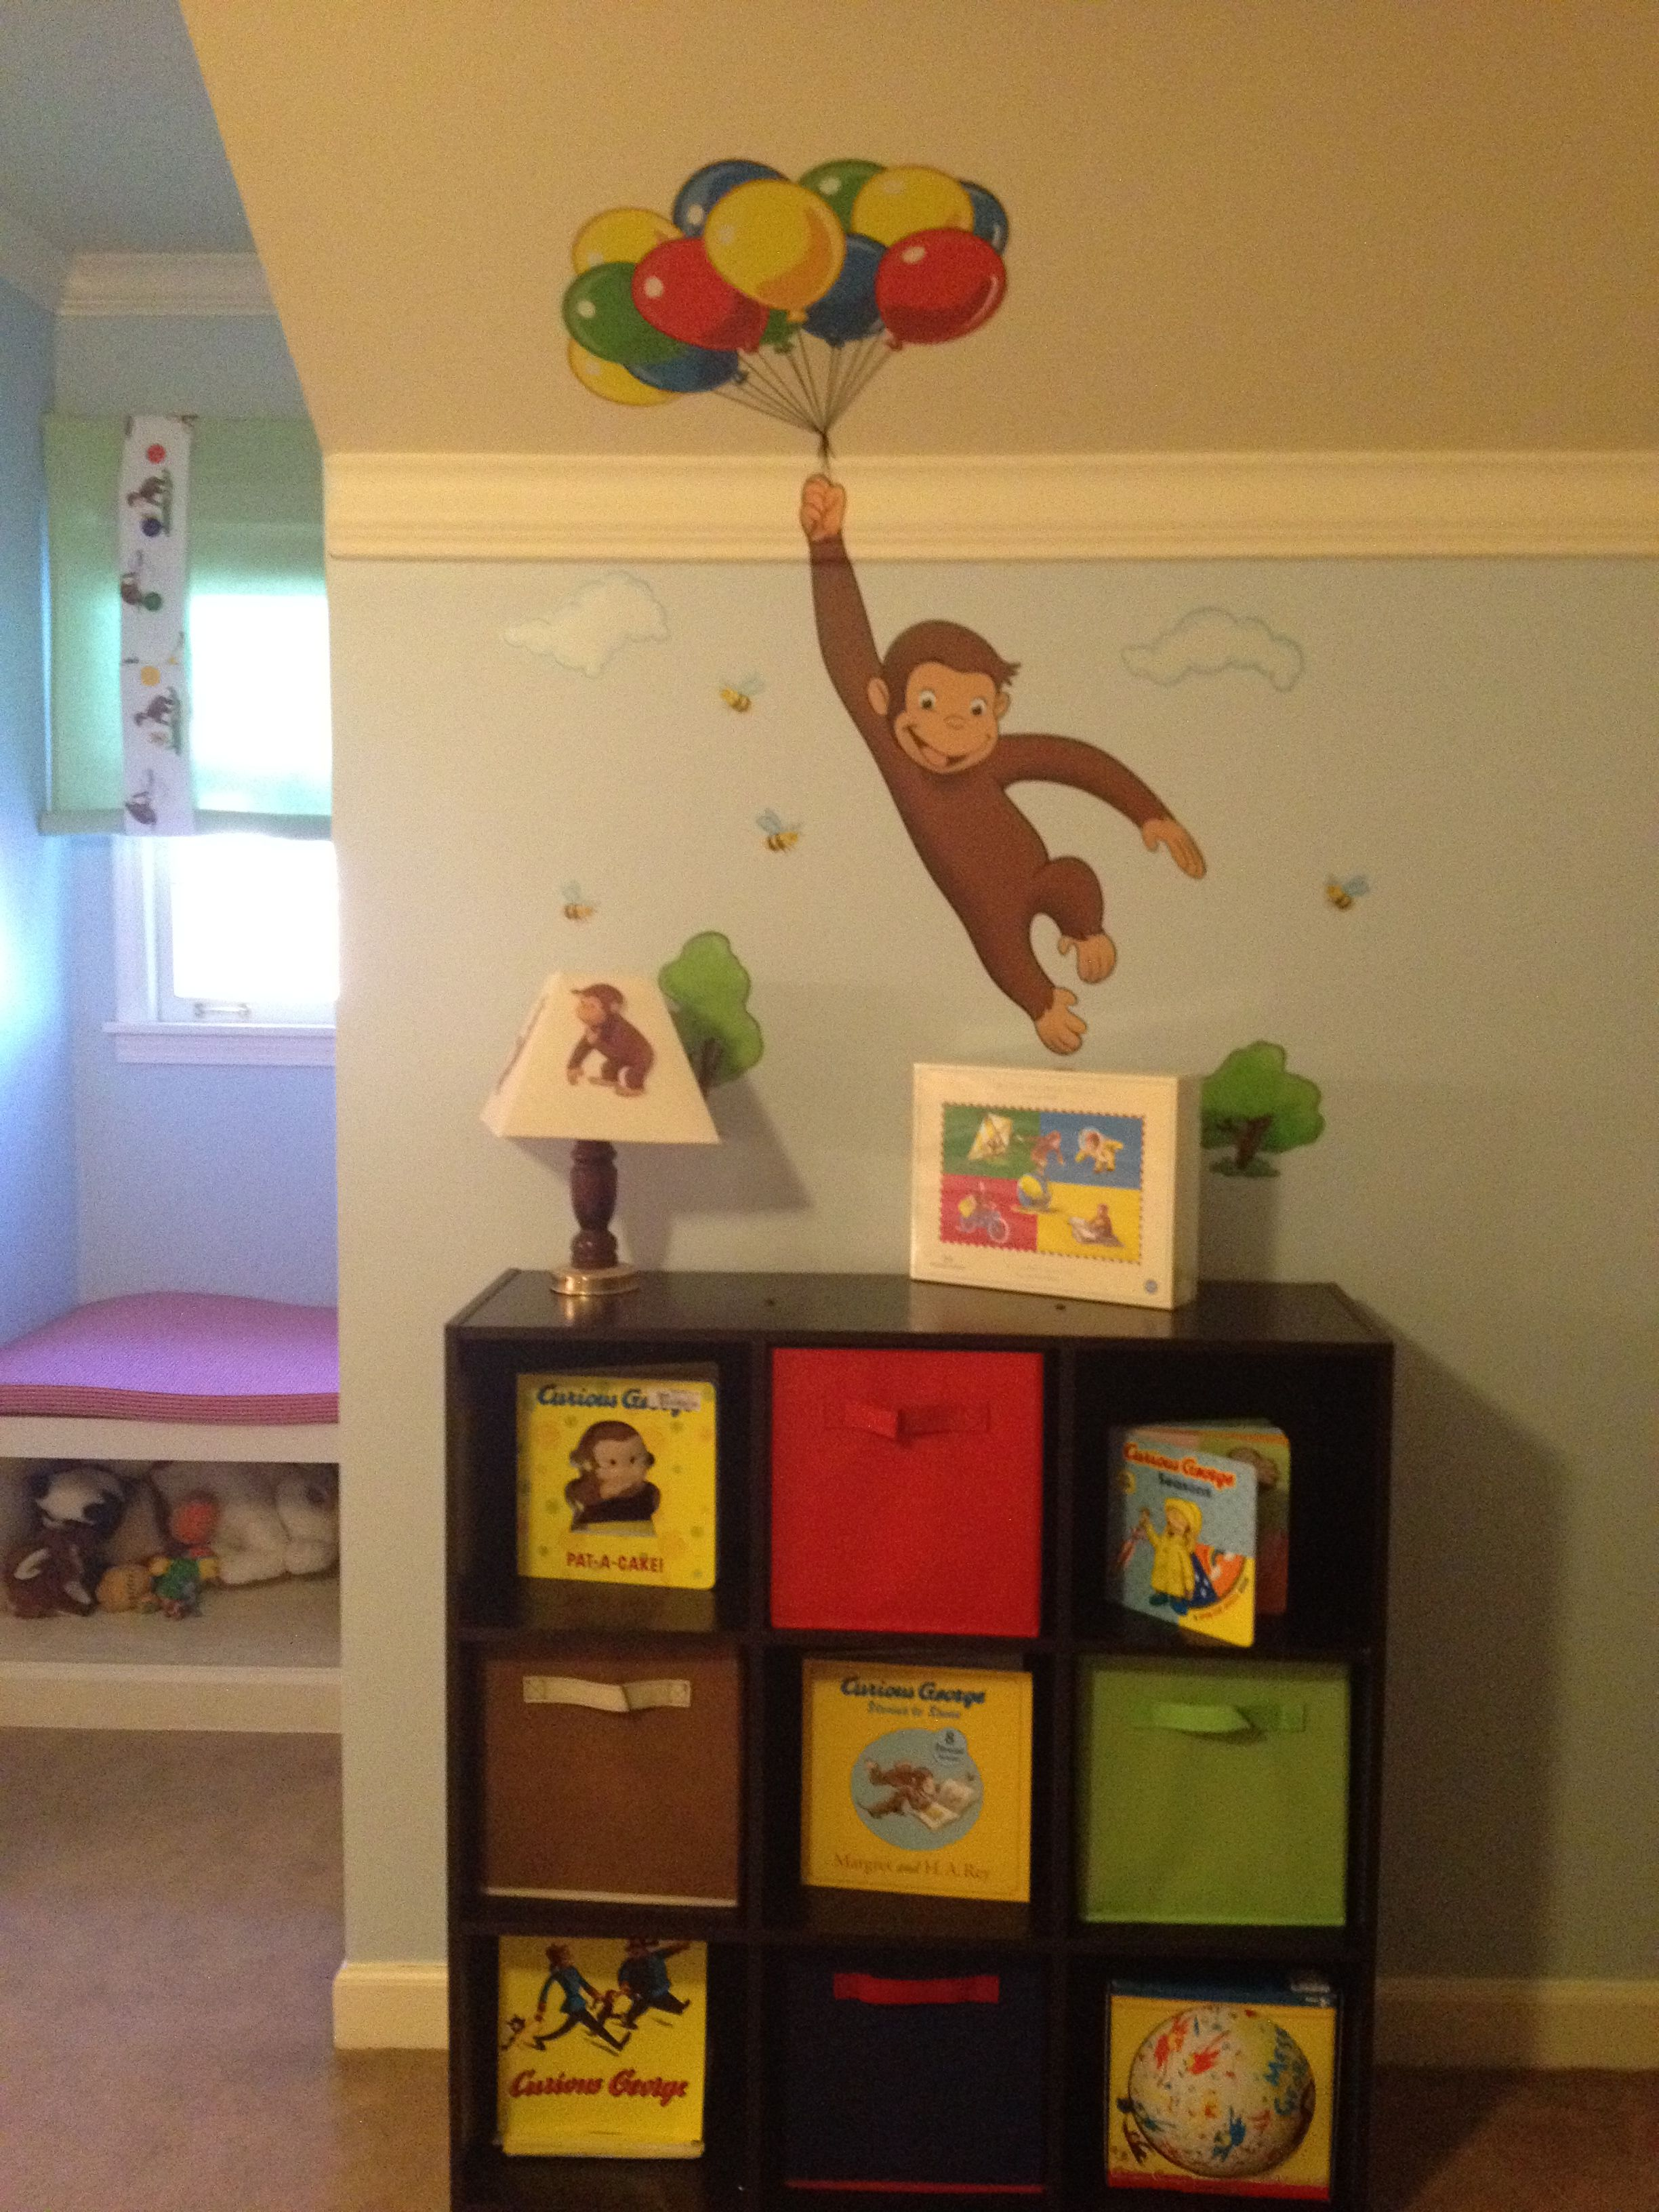 Rhett's Curious George Room